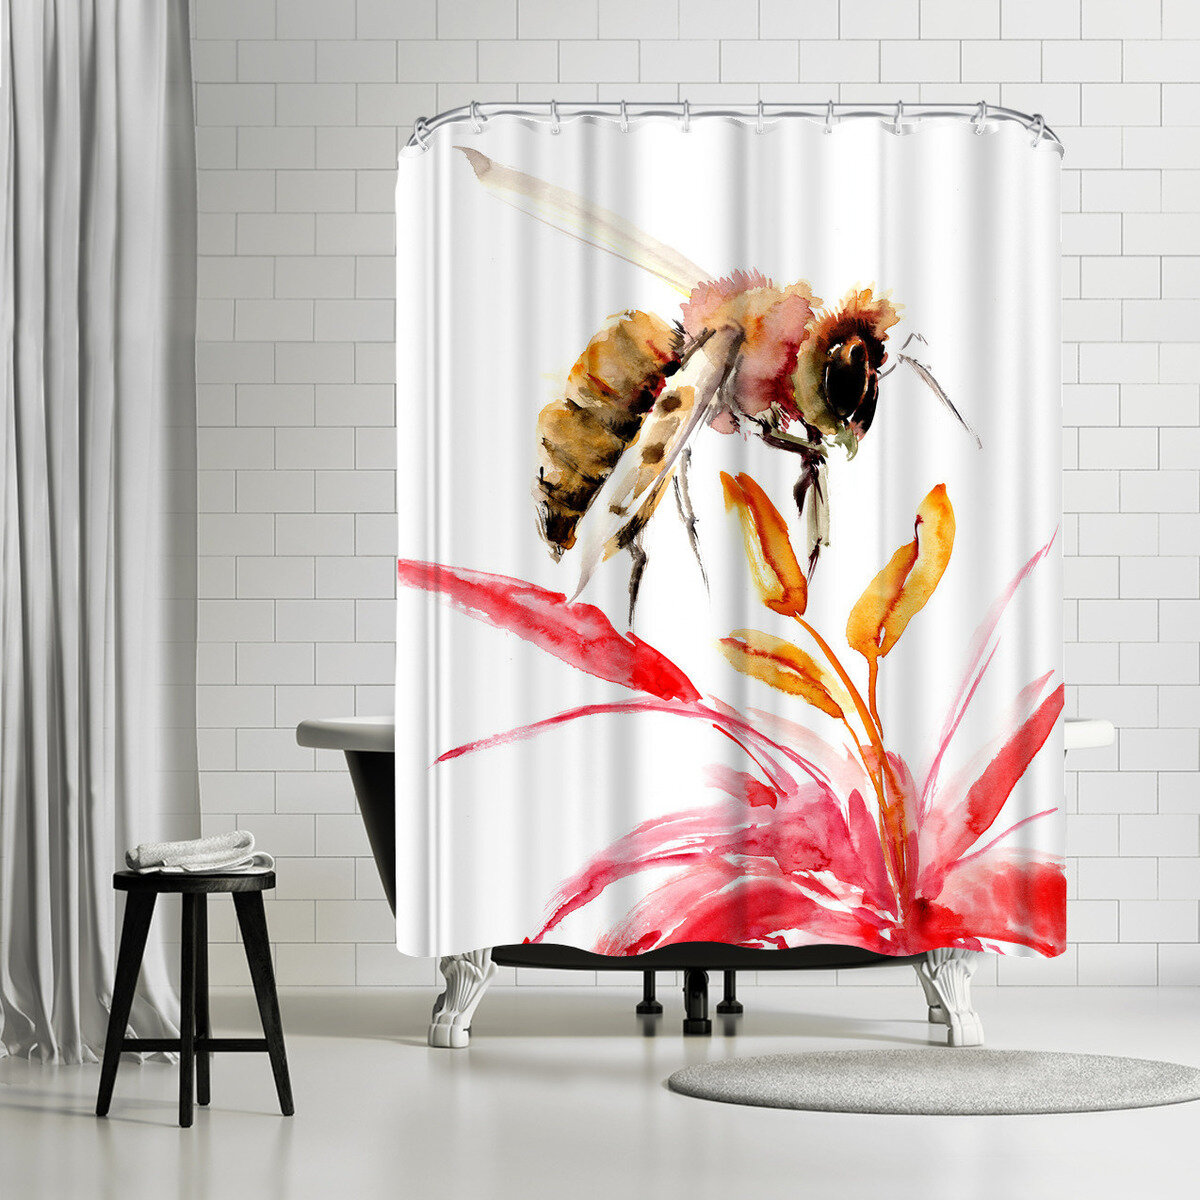 East Urban Home Suren Nersisyan Honey Bee 2 Single Shower Curtain Wayfair